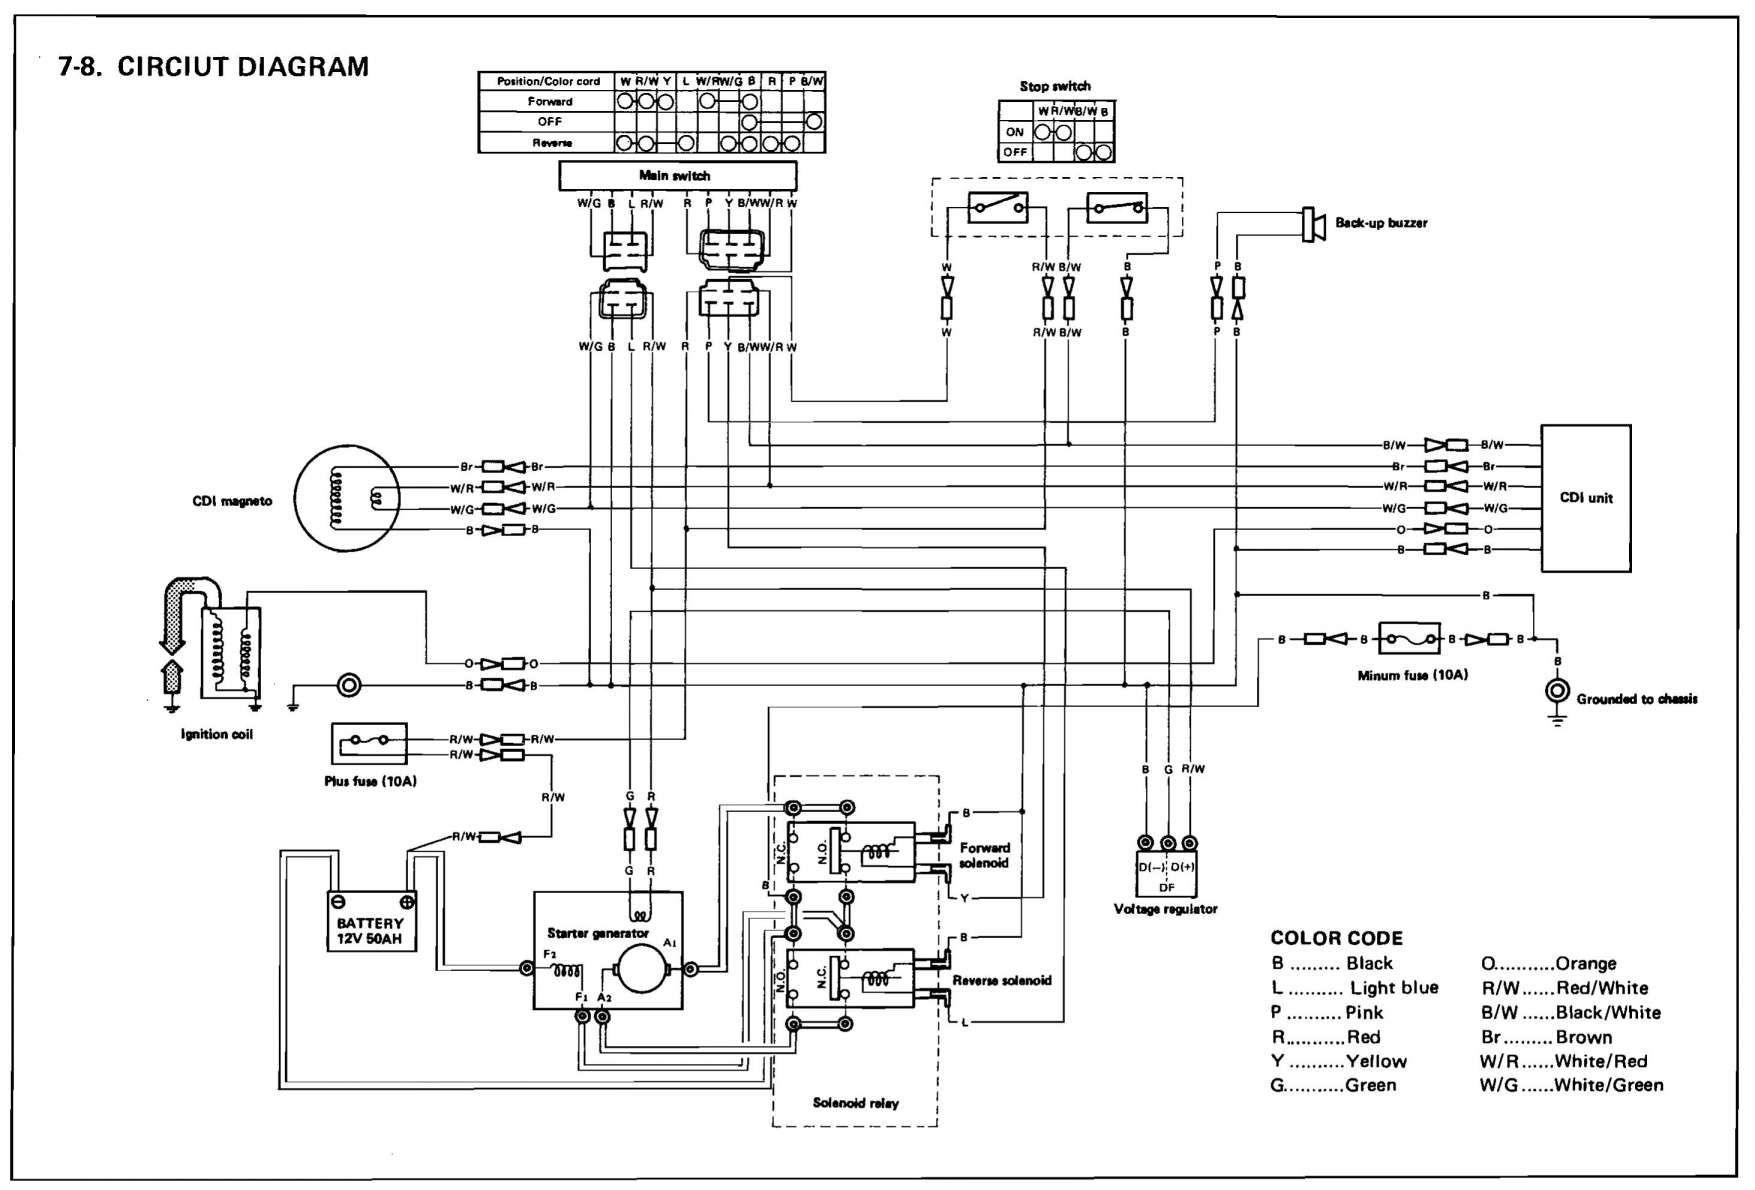 Chrysler Gem E4 Wiring Diagram | Wiring Diagrams Ally Expert | Gem E825 Wiring Schematic |  | Hotel Plinio Lenno